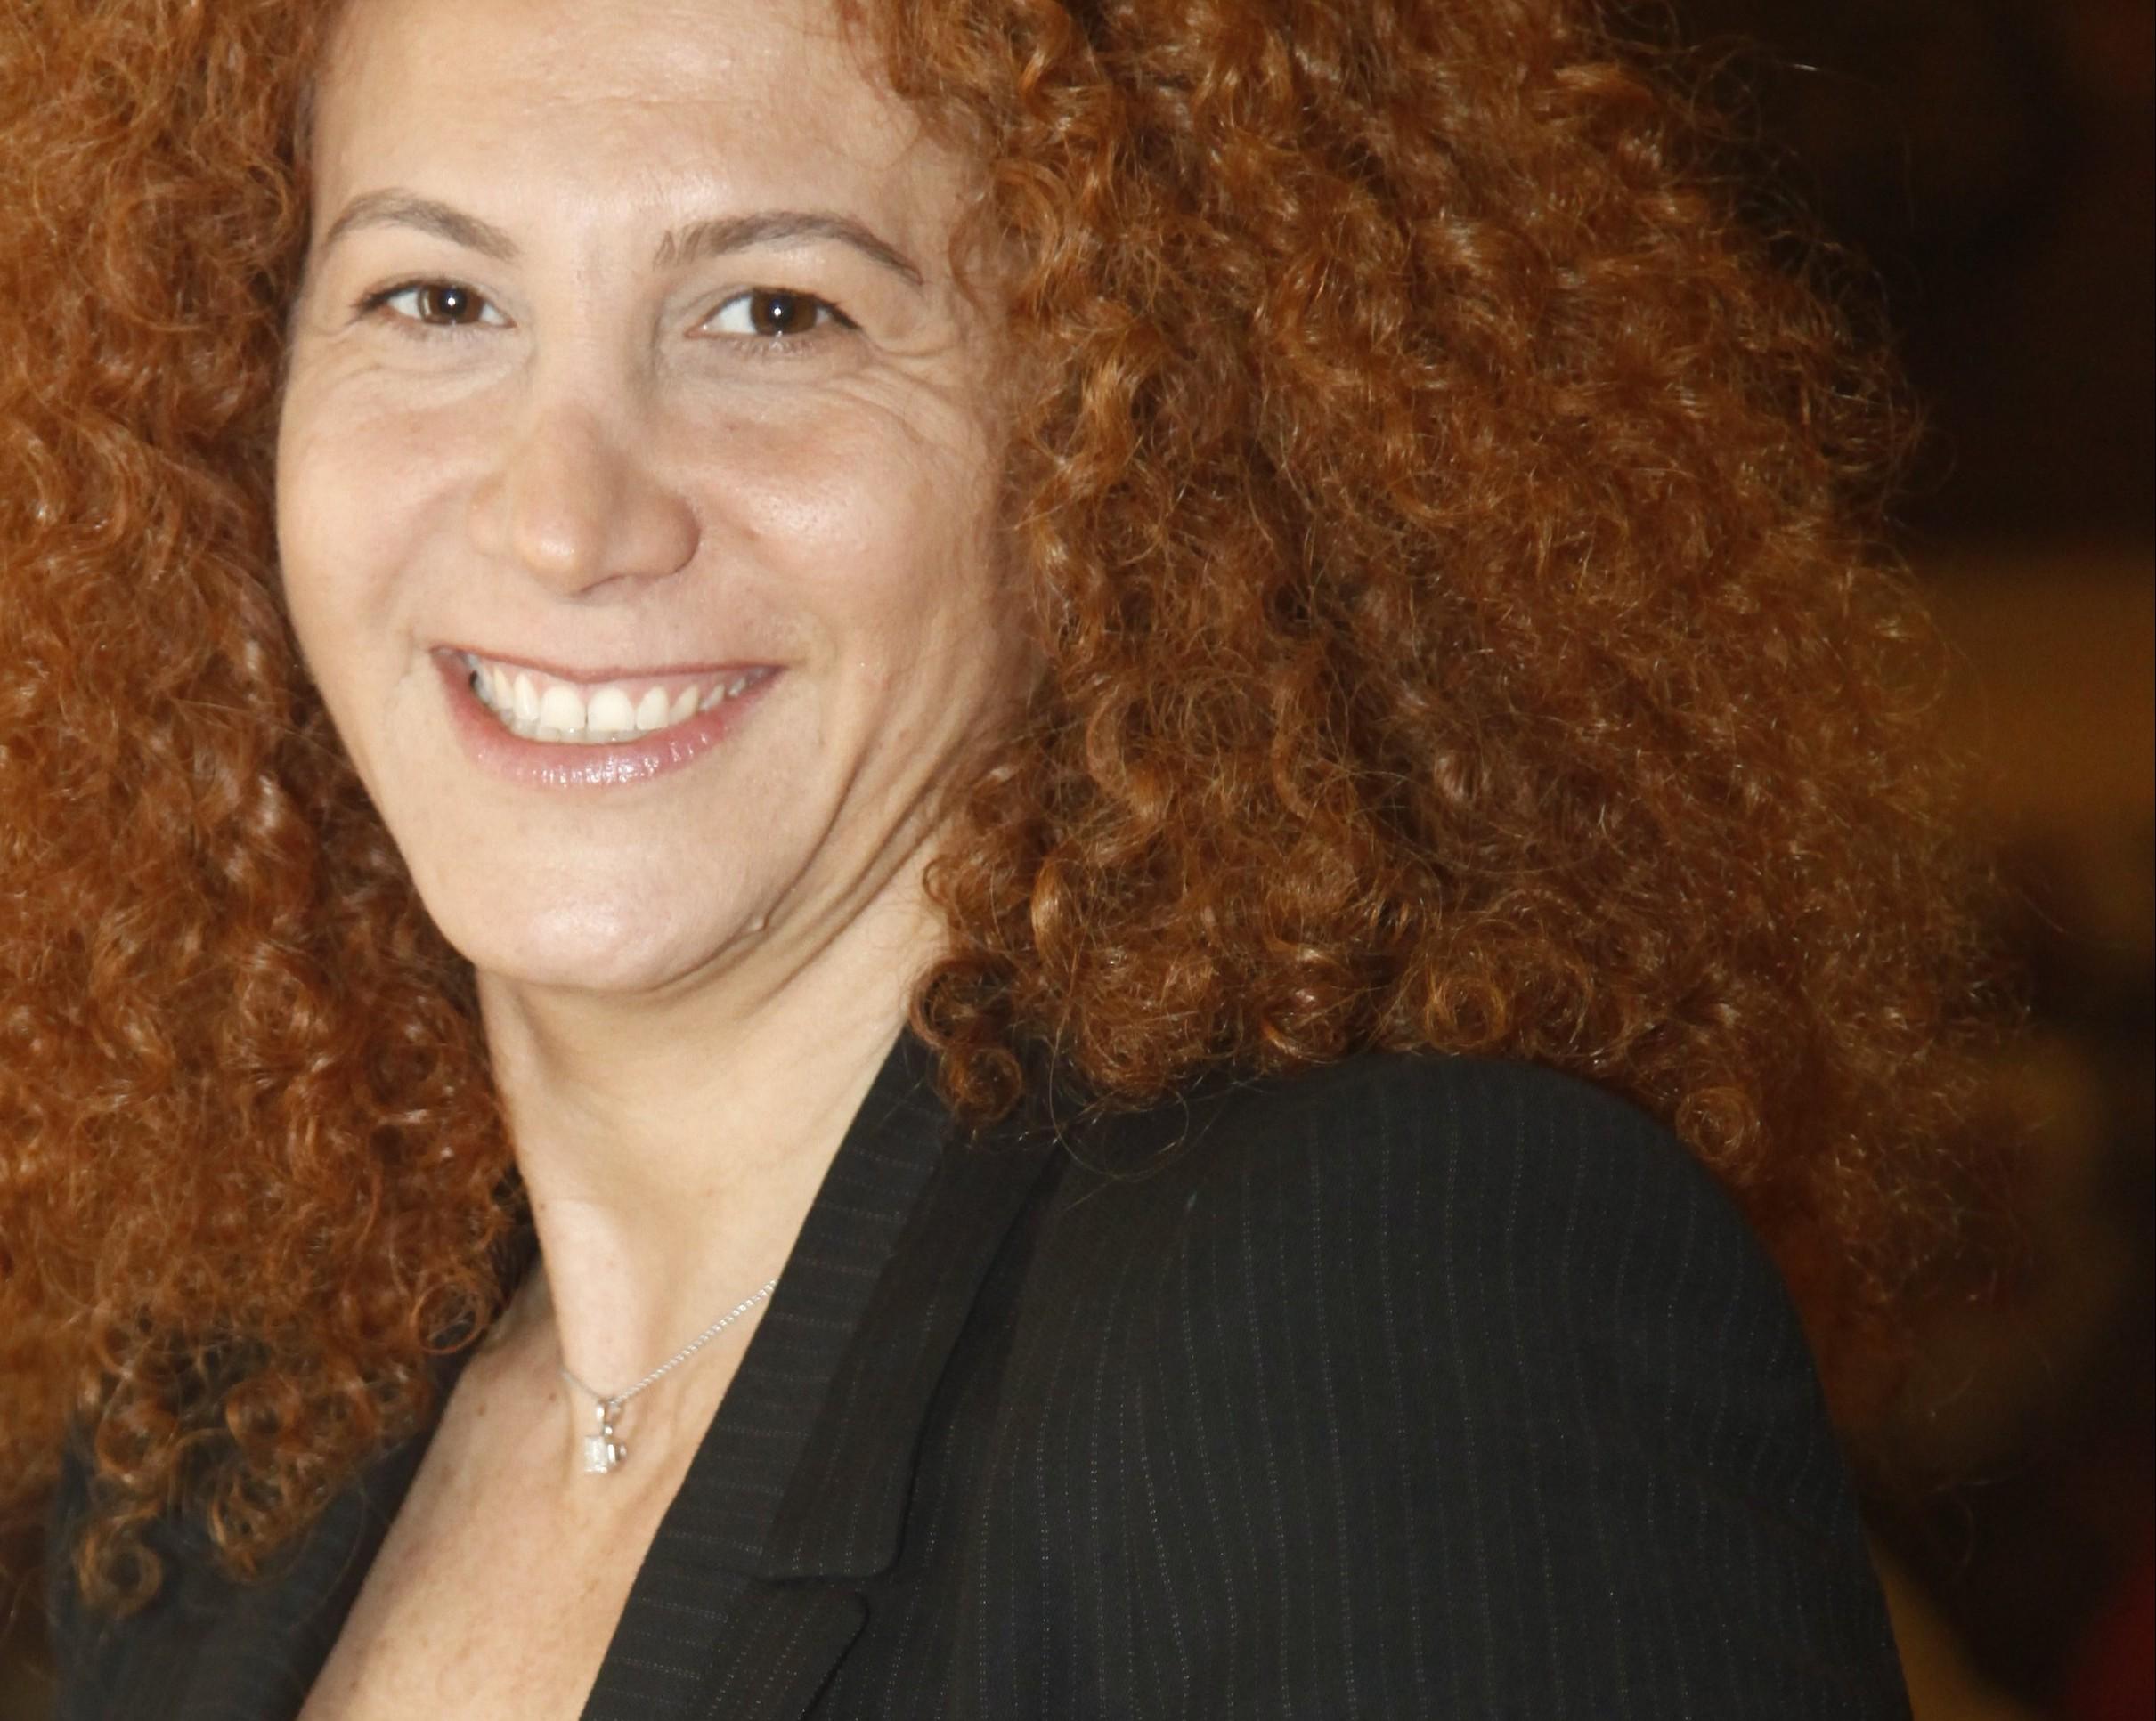 Aline kamakian global banking alliance for women for Armenian cuisine aline kamakian